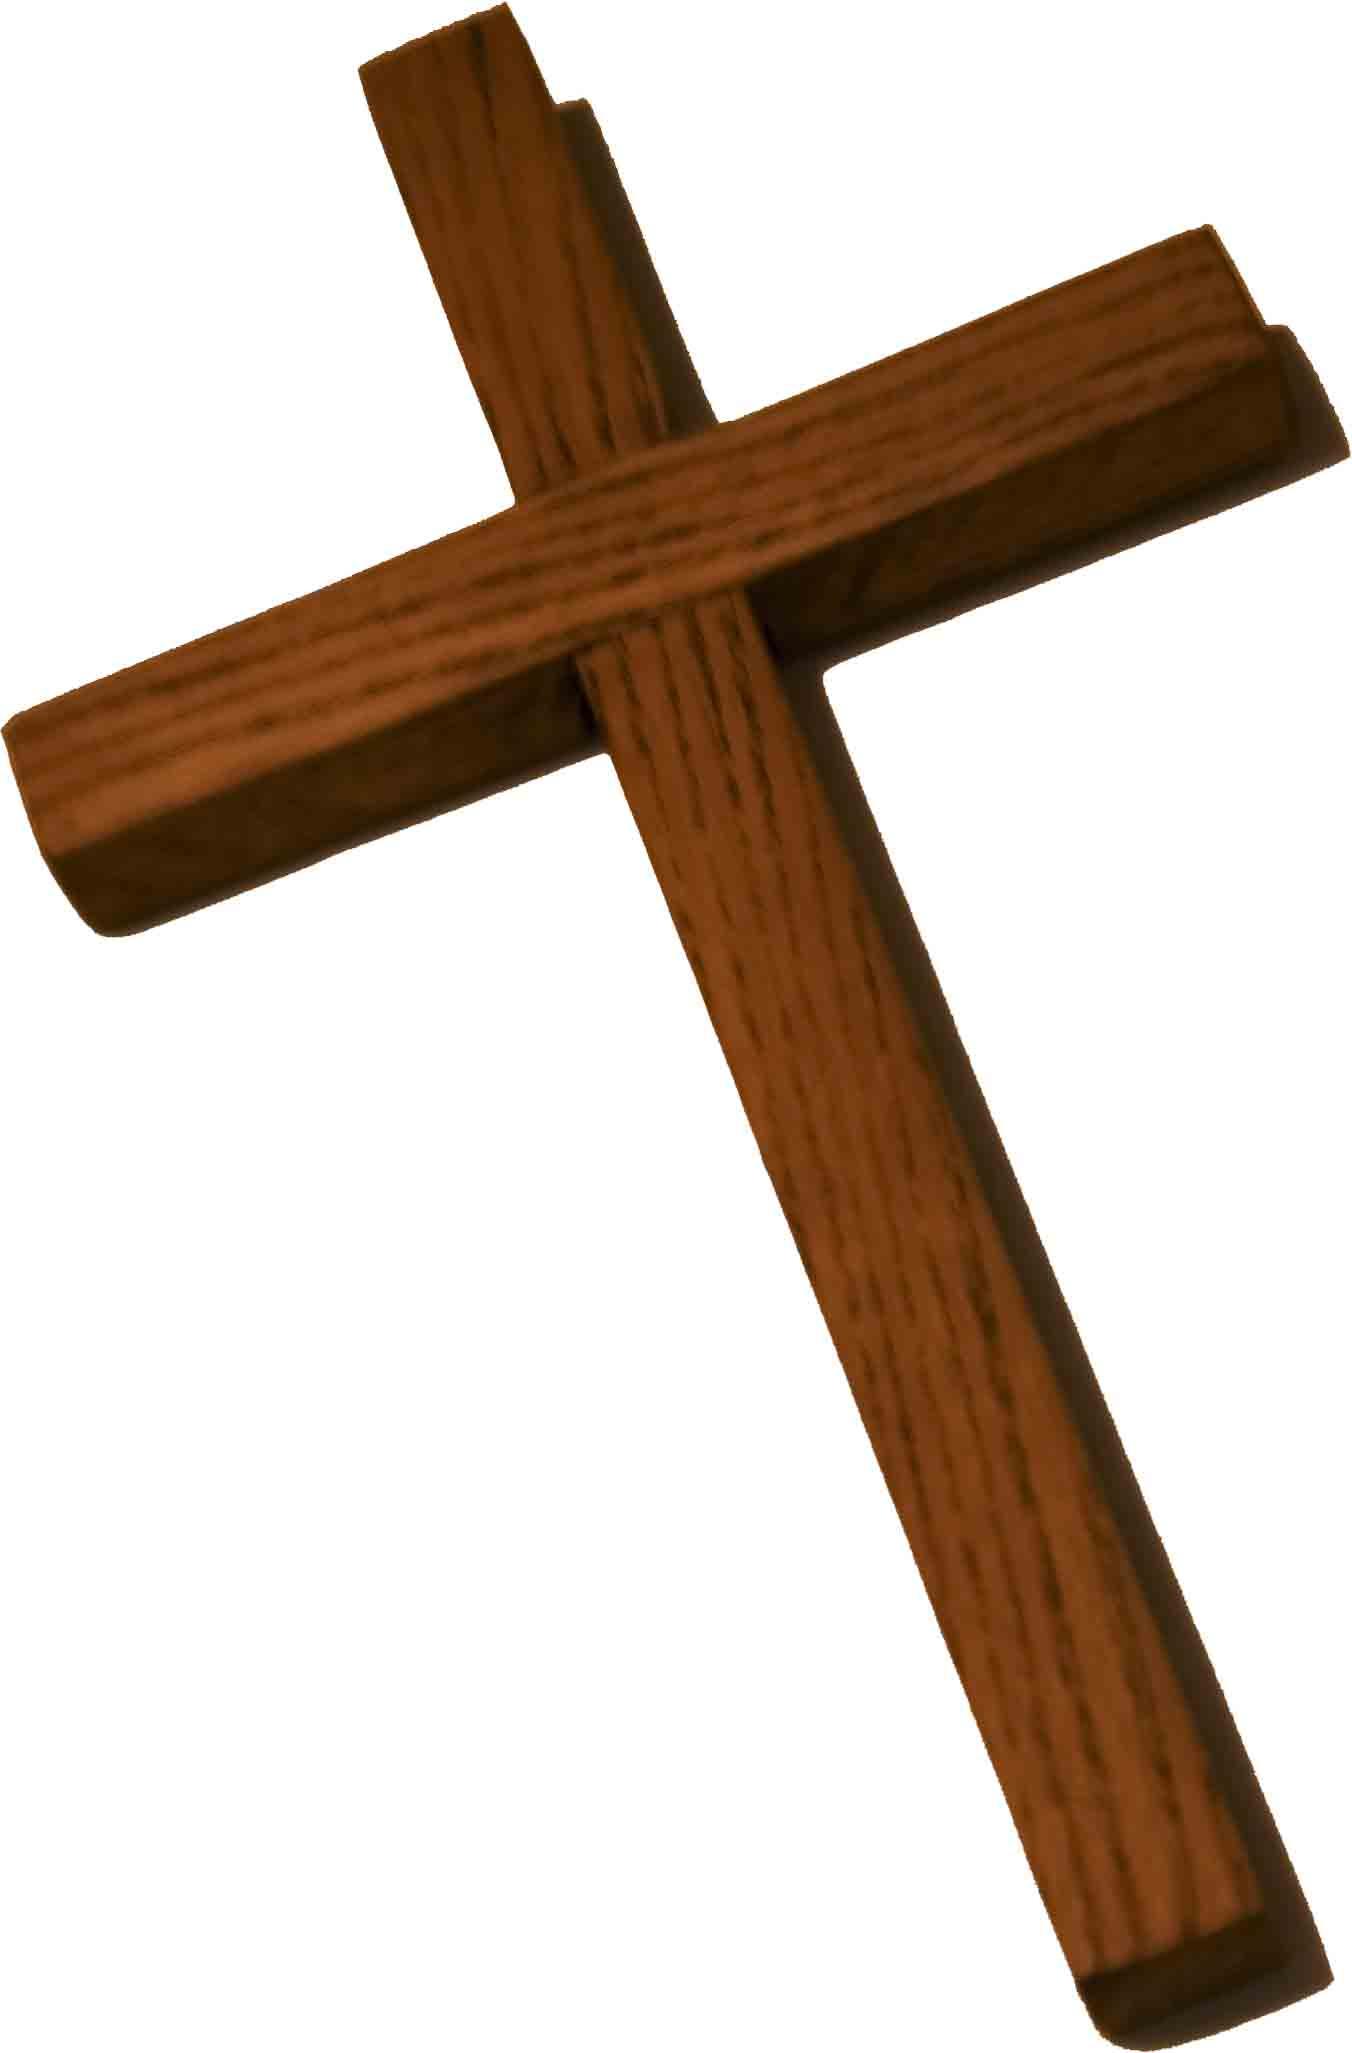 Holy Cross Clipart - Wooden Cross Transparent Background , HD Wallpaper & Backgrounds